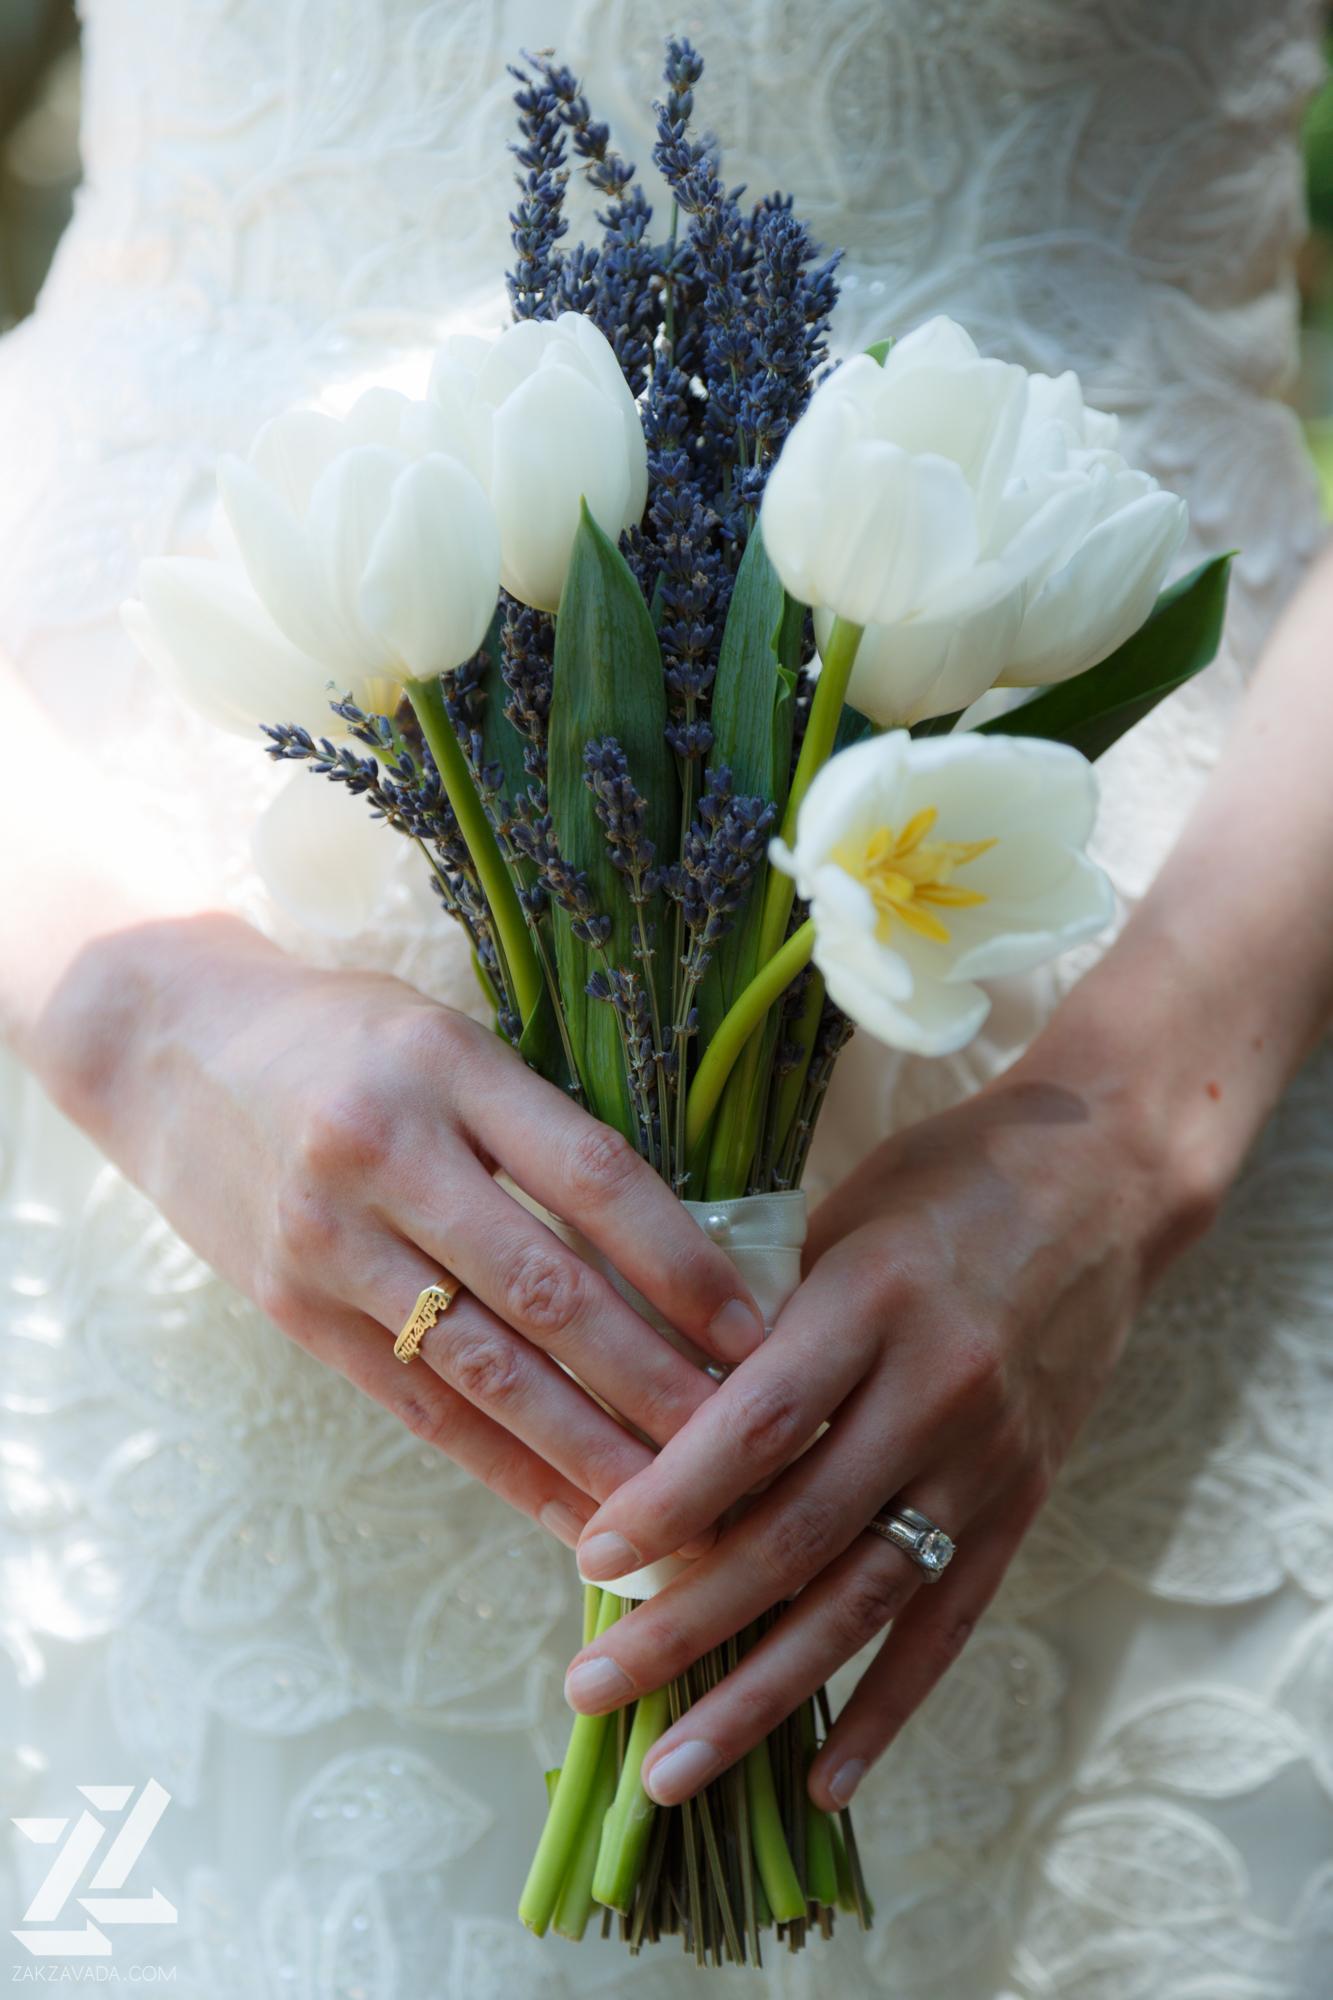 scranton-wedding-photography-zak-zavada-ruddyBelcastroWedding-698.jpg